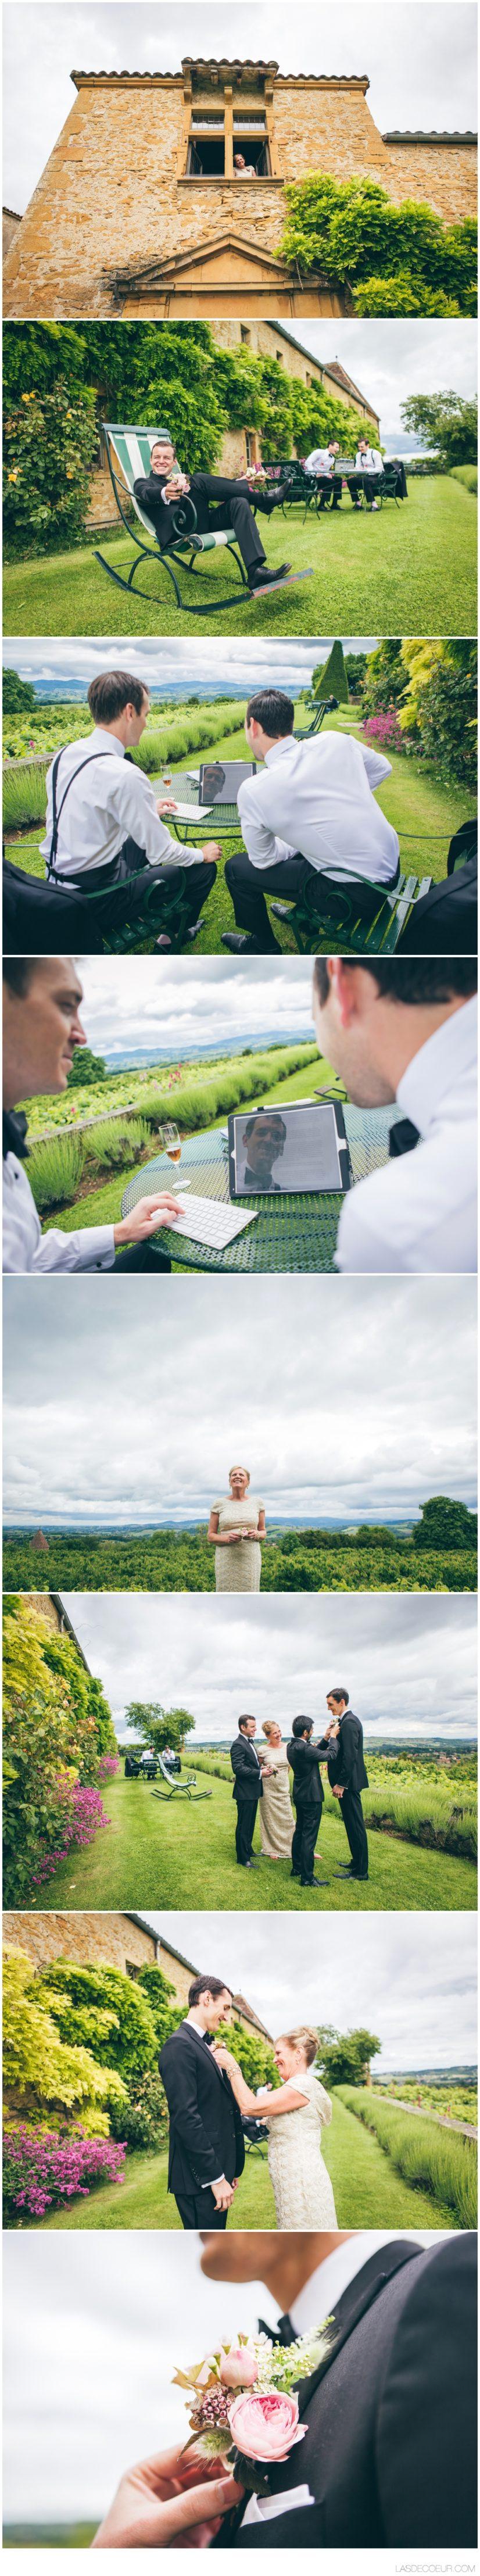 Photographe vidéaste mariage Lyon Chateau Bagnols